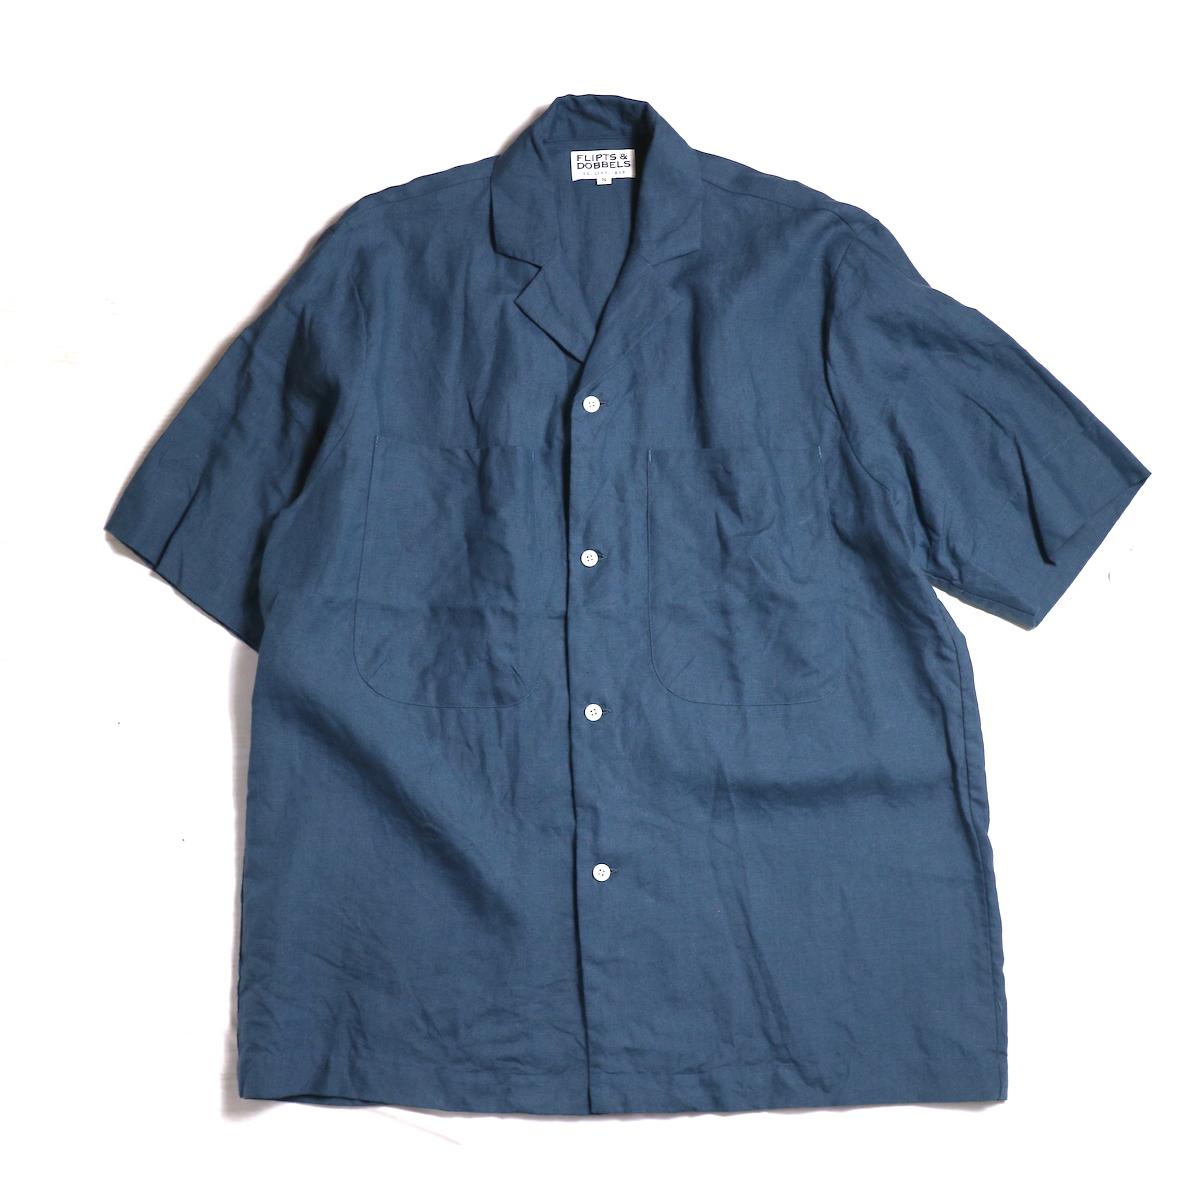 FLIPTS & DOBBELS /  Open S/S Shirts -Petrol